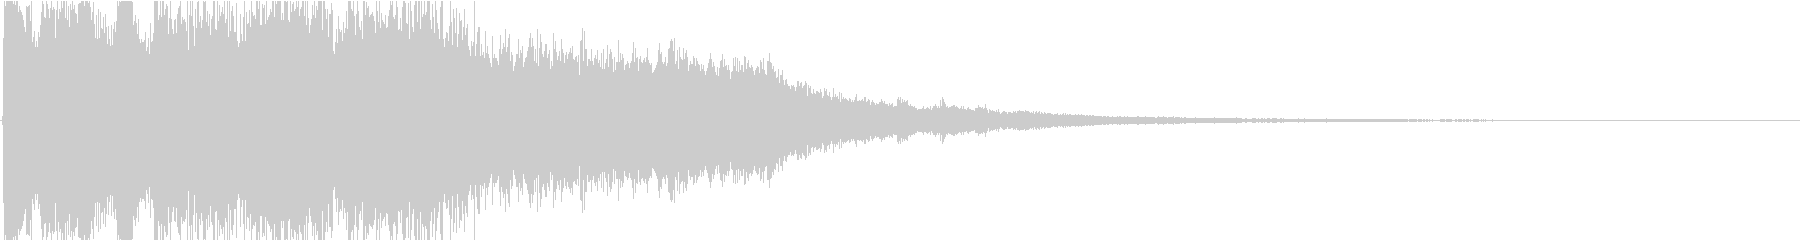 8bitとピアノの場面転換ジングルの未再生の波形